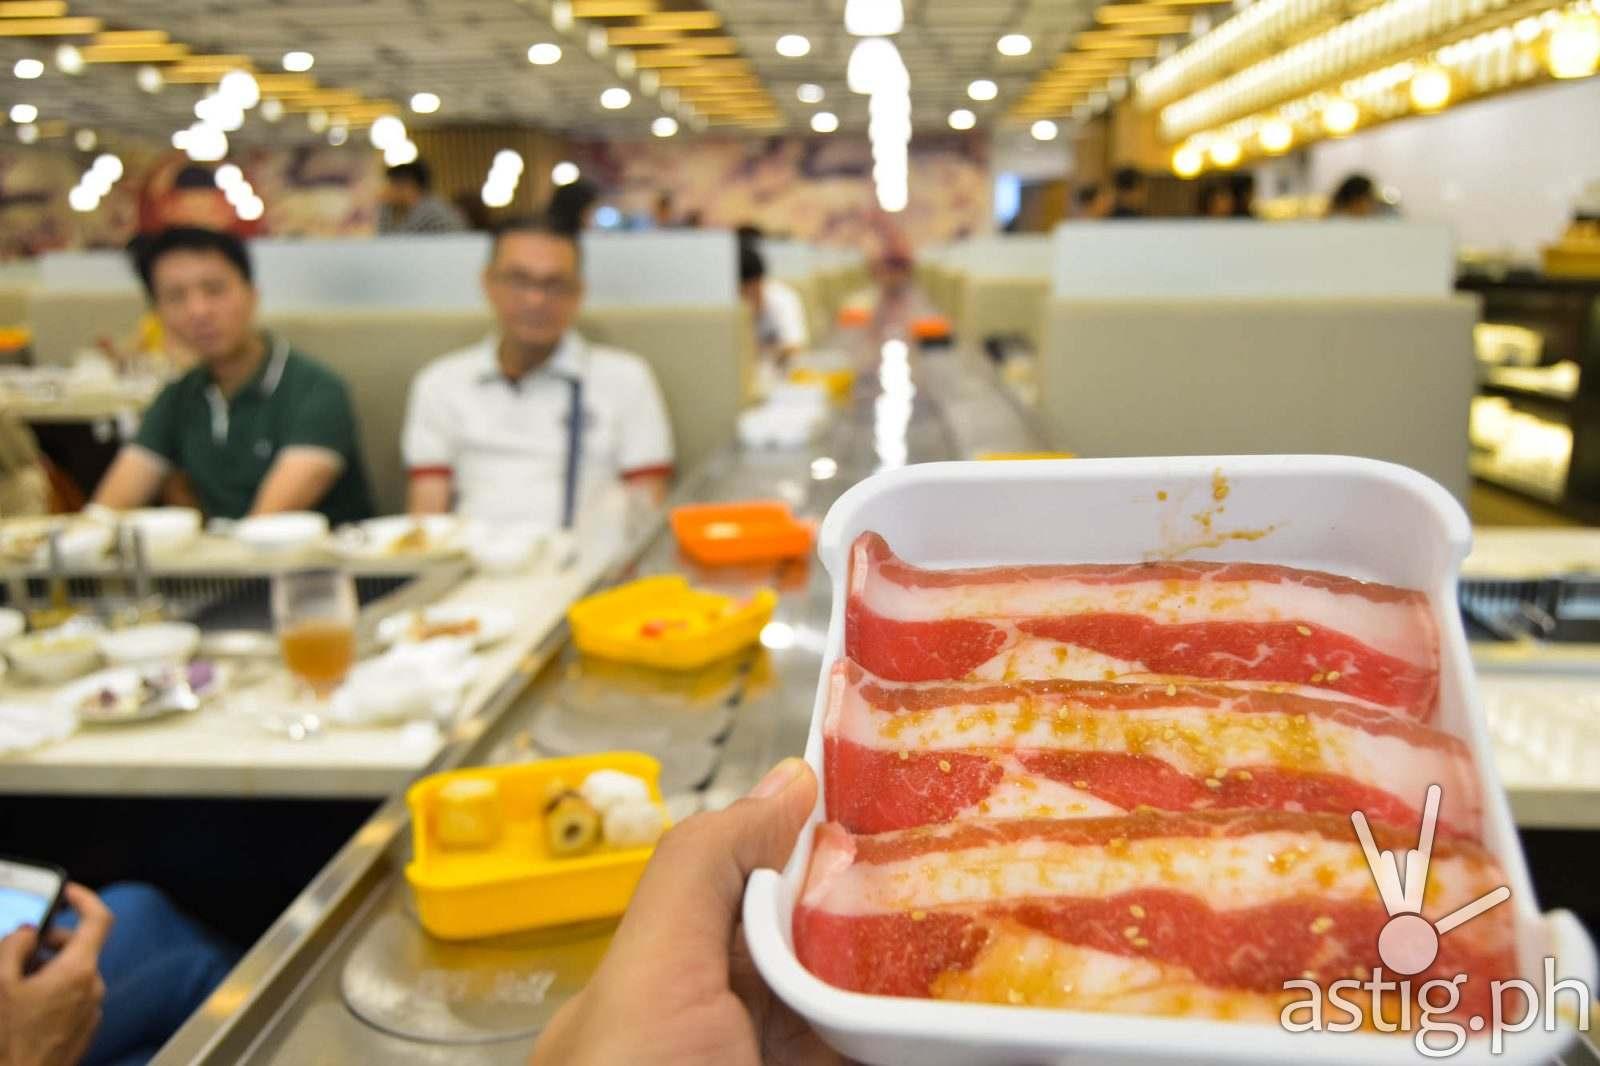 Meat conveyor belt - Hosaku International Buffet Philippines SM North Tower 2